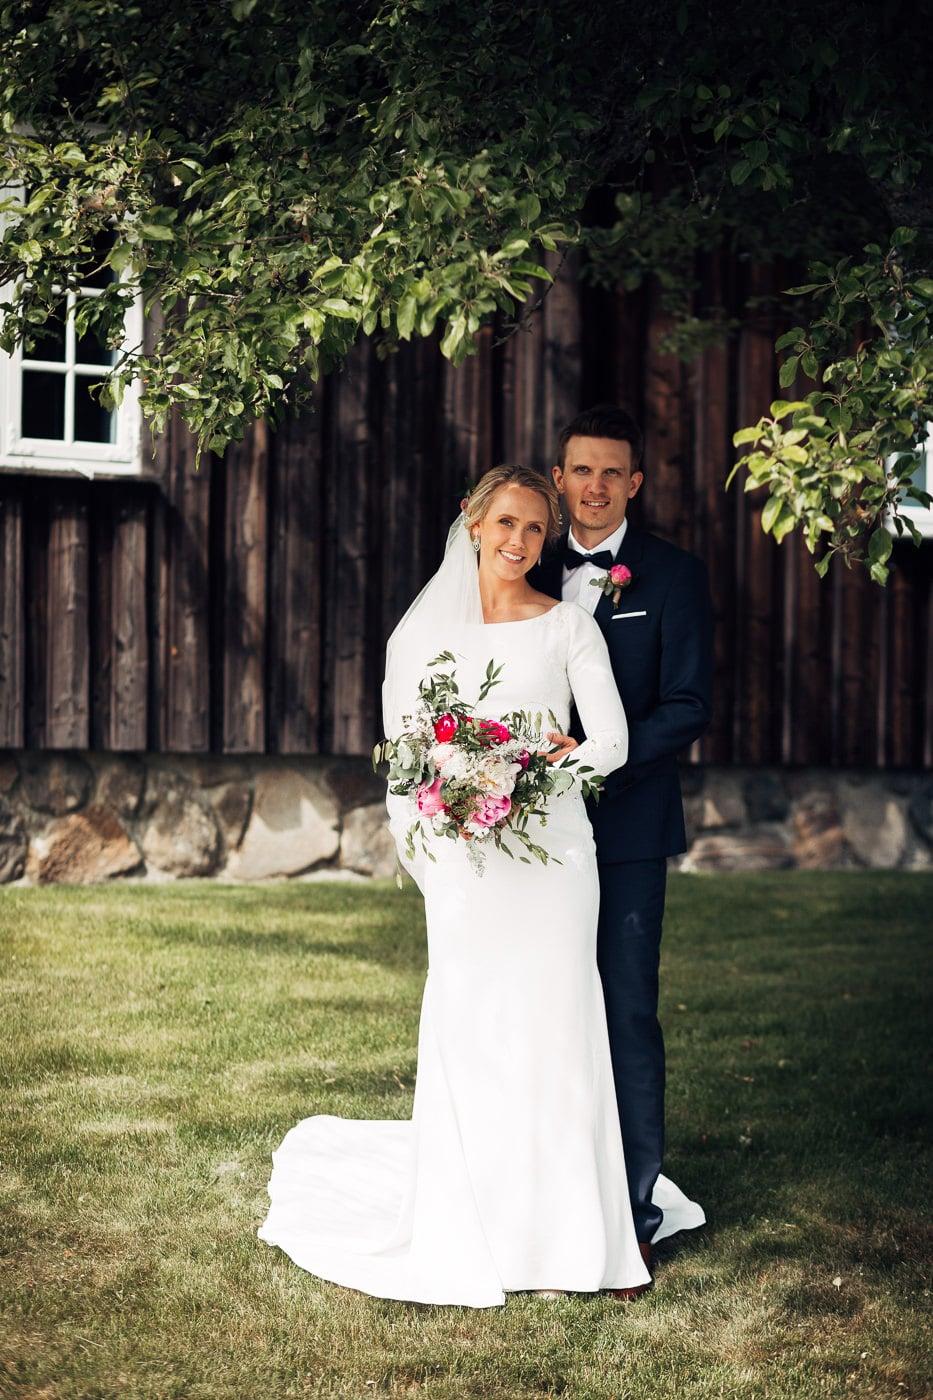 Karoline & Andreas - bryllup i Østfold med magiske detaljer Bryllup Fredrikstad Fotograf 36